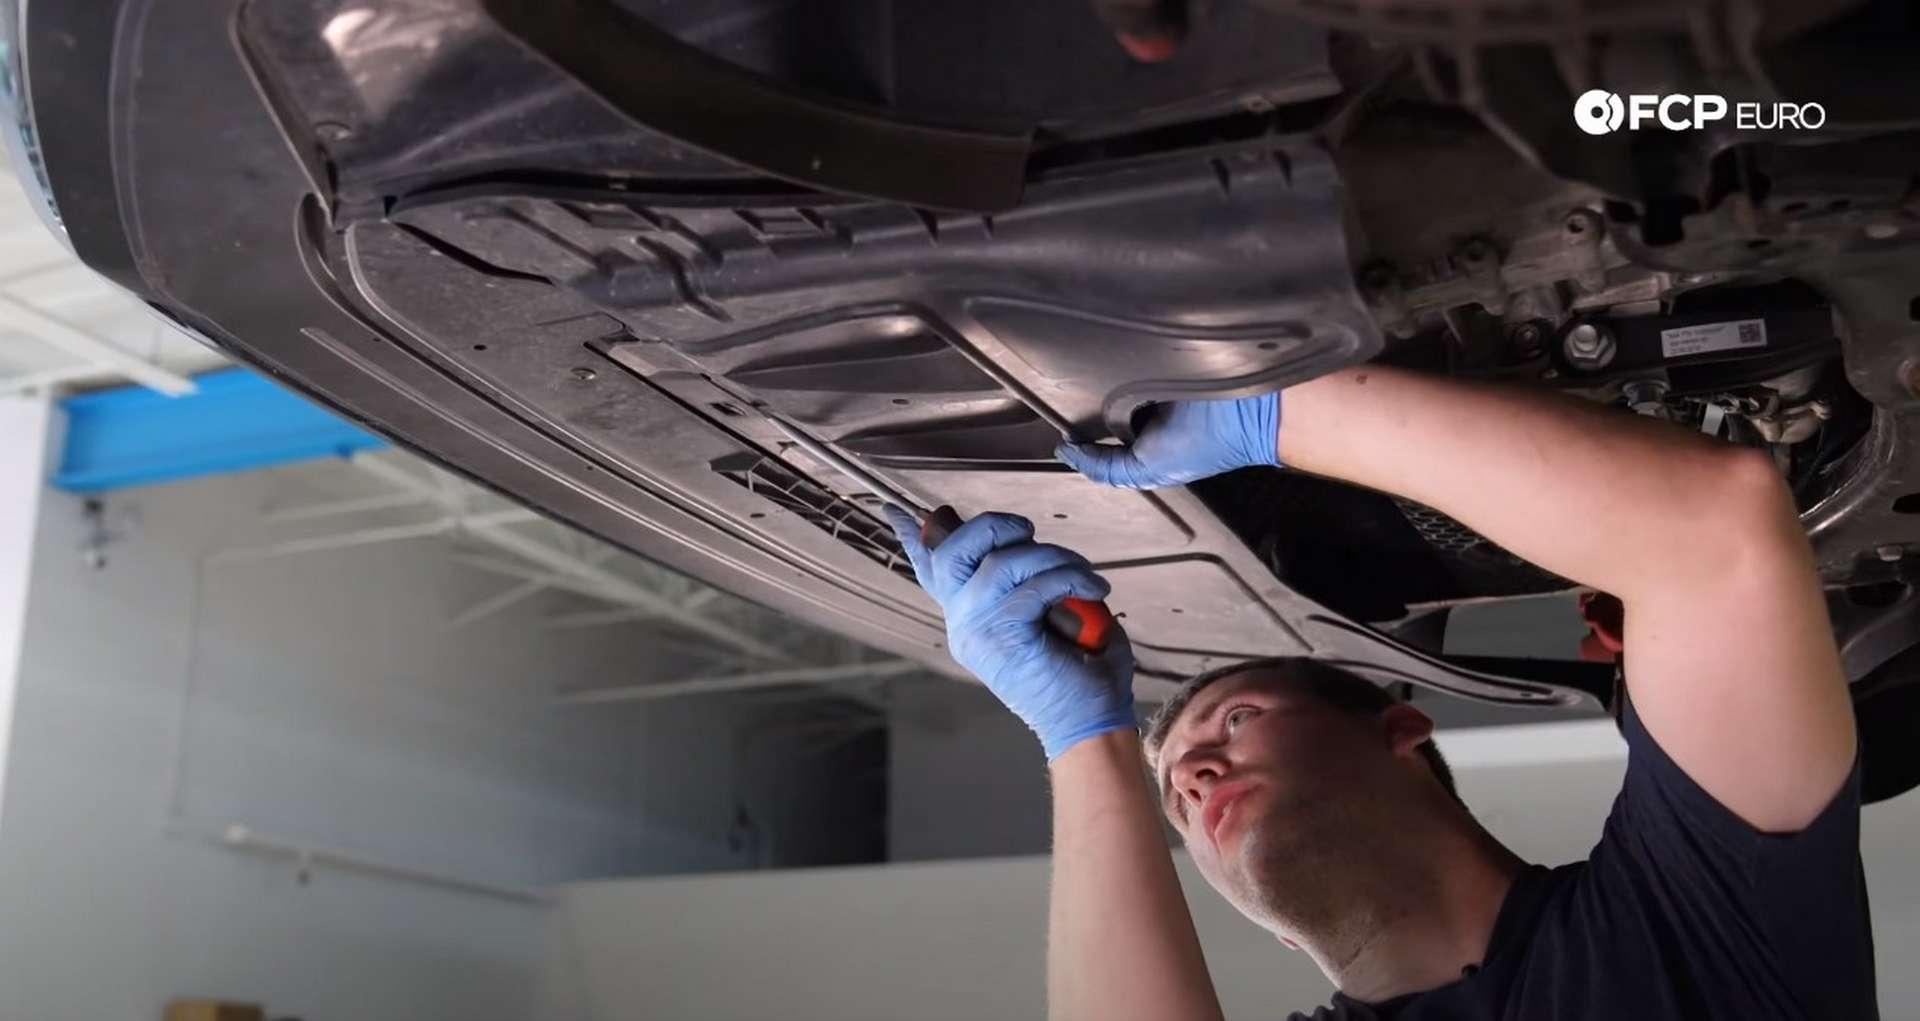 18-DIY_VW_GTI_Clutch-Job-Draining-Fluids